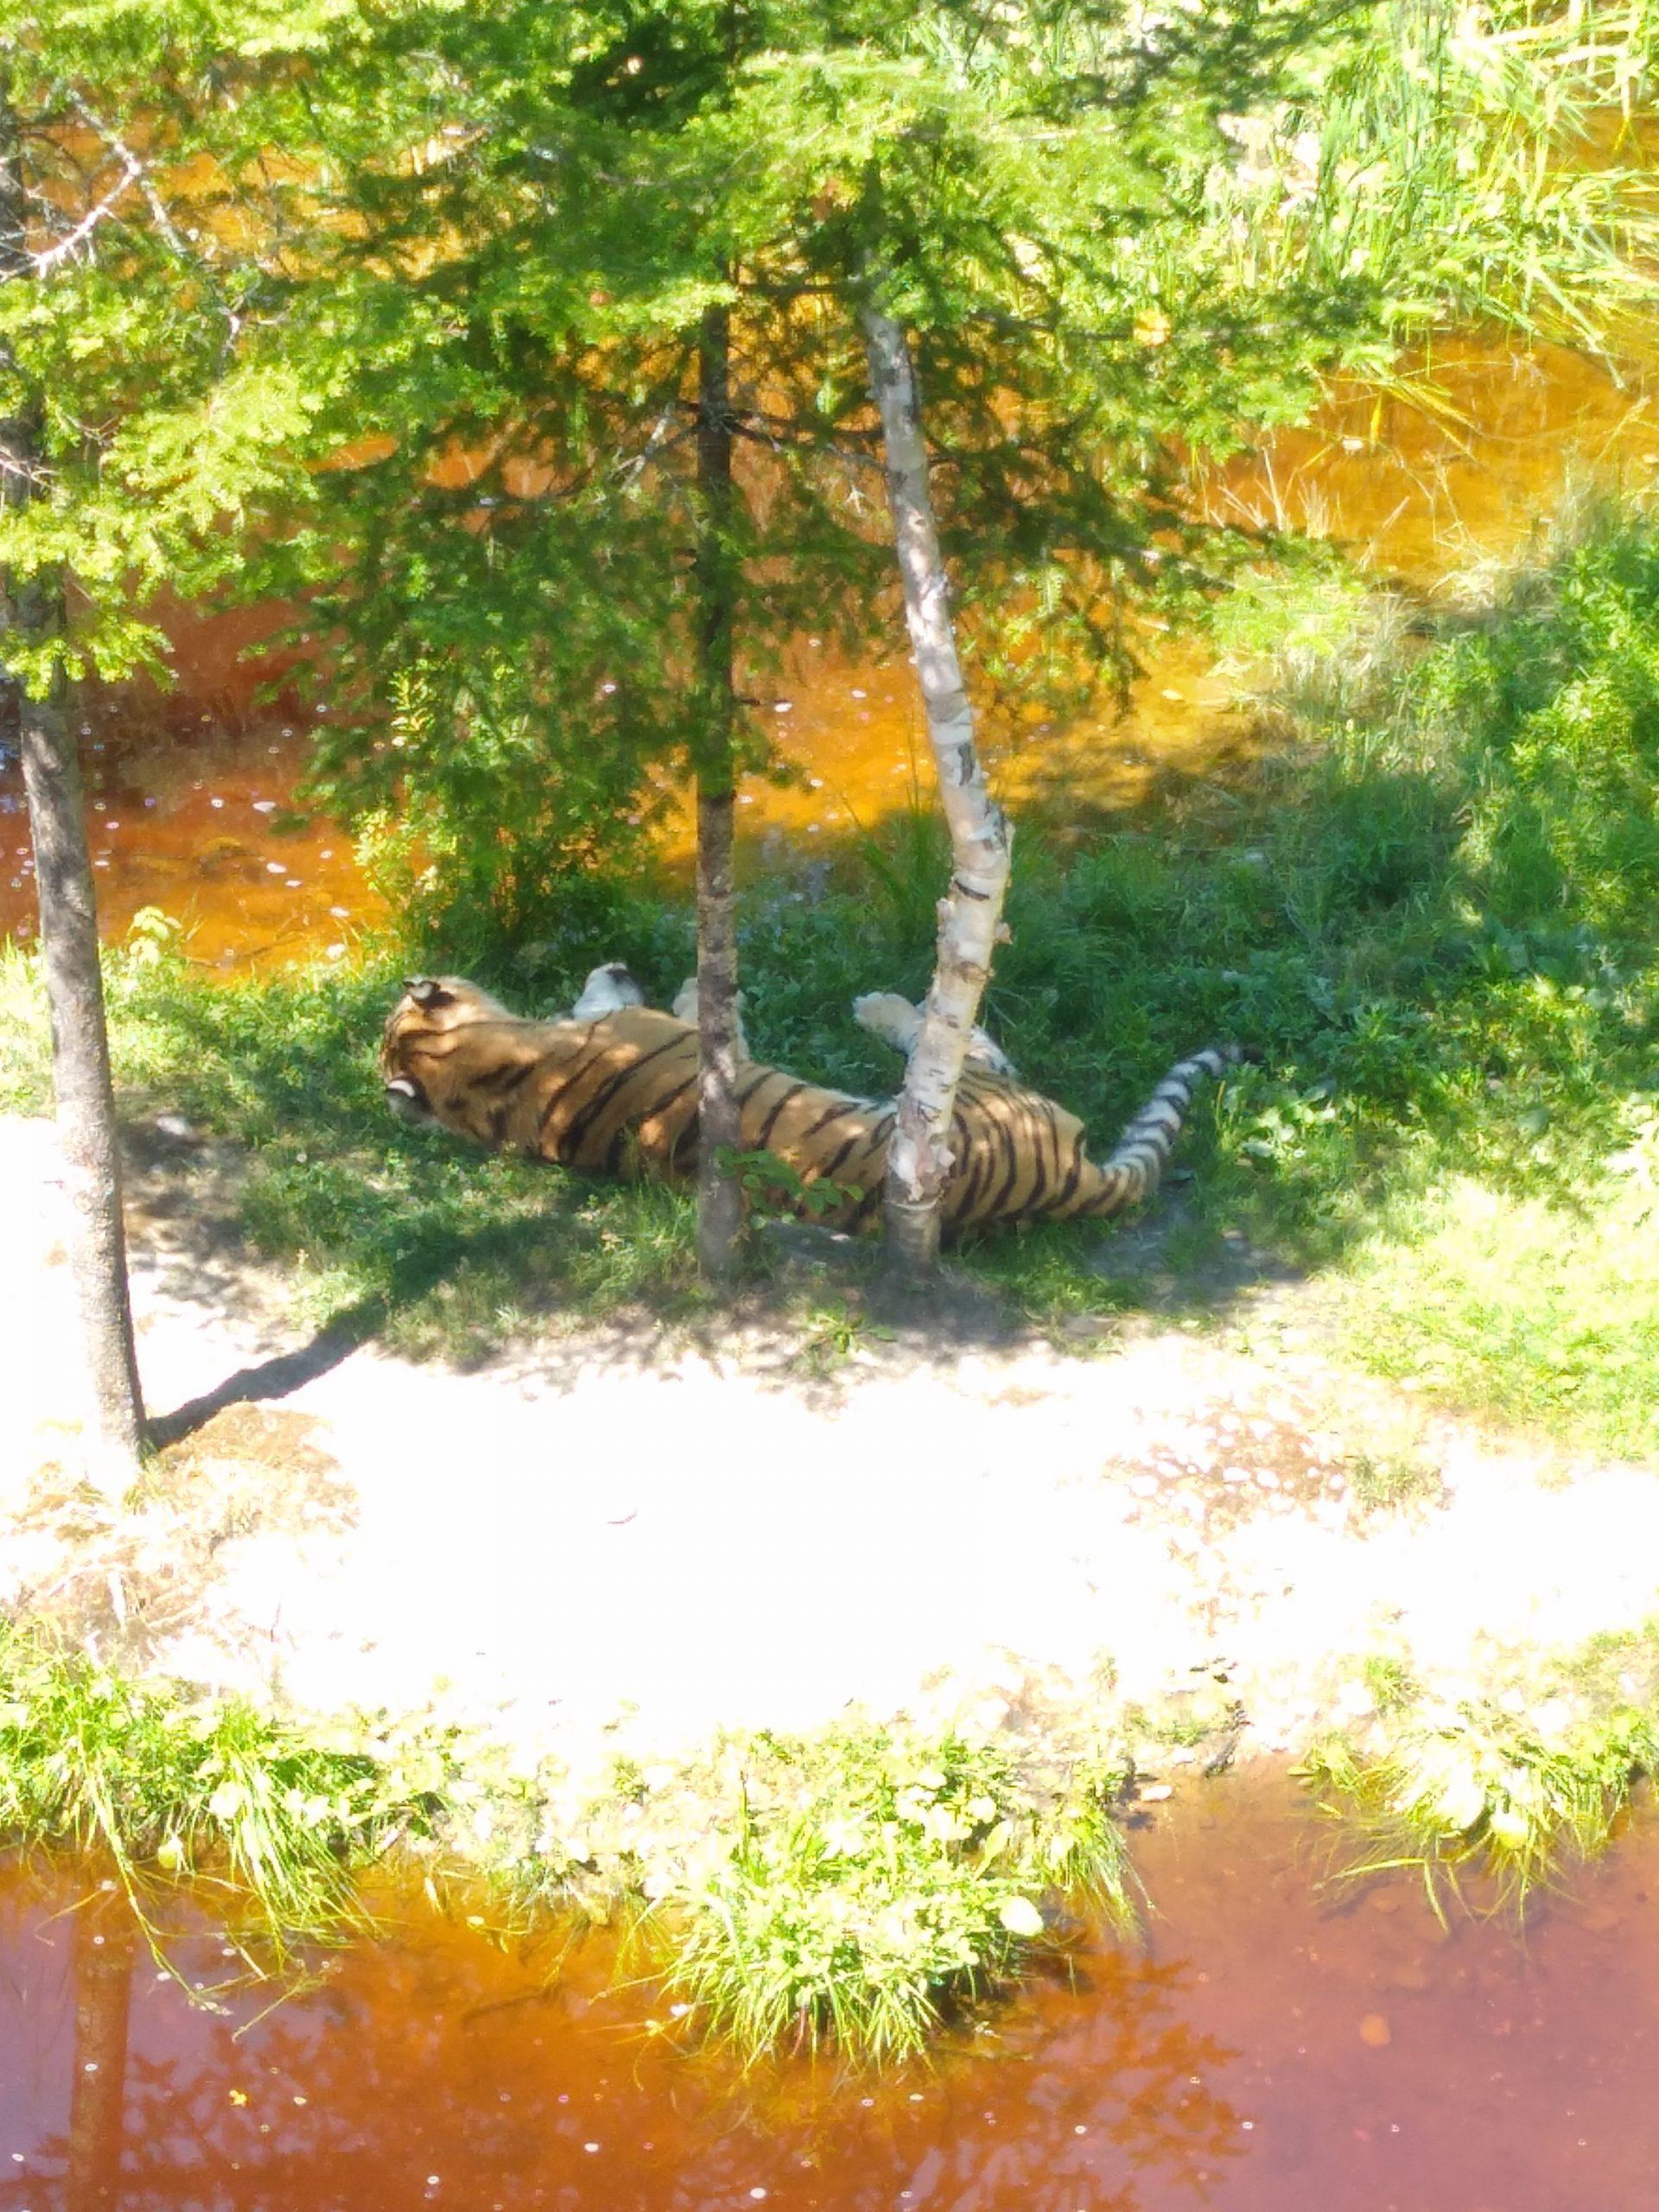 Animaux zoo sauvage saint-félicien